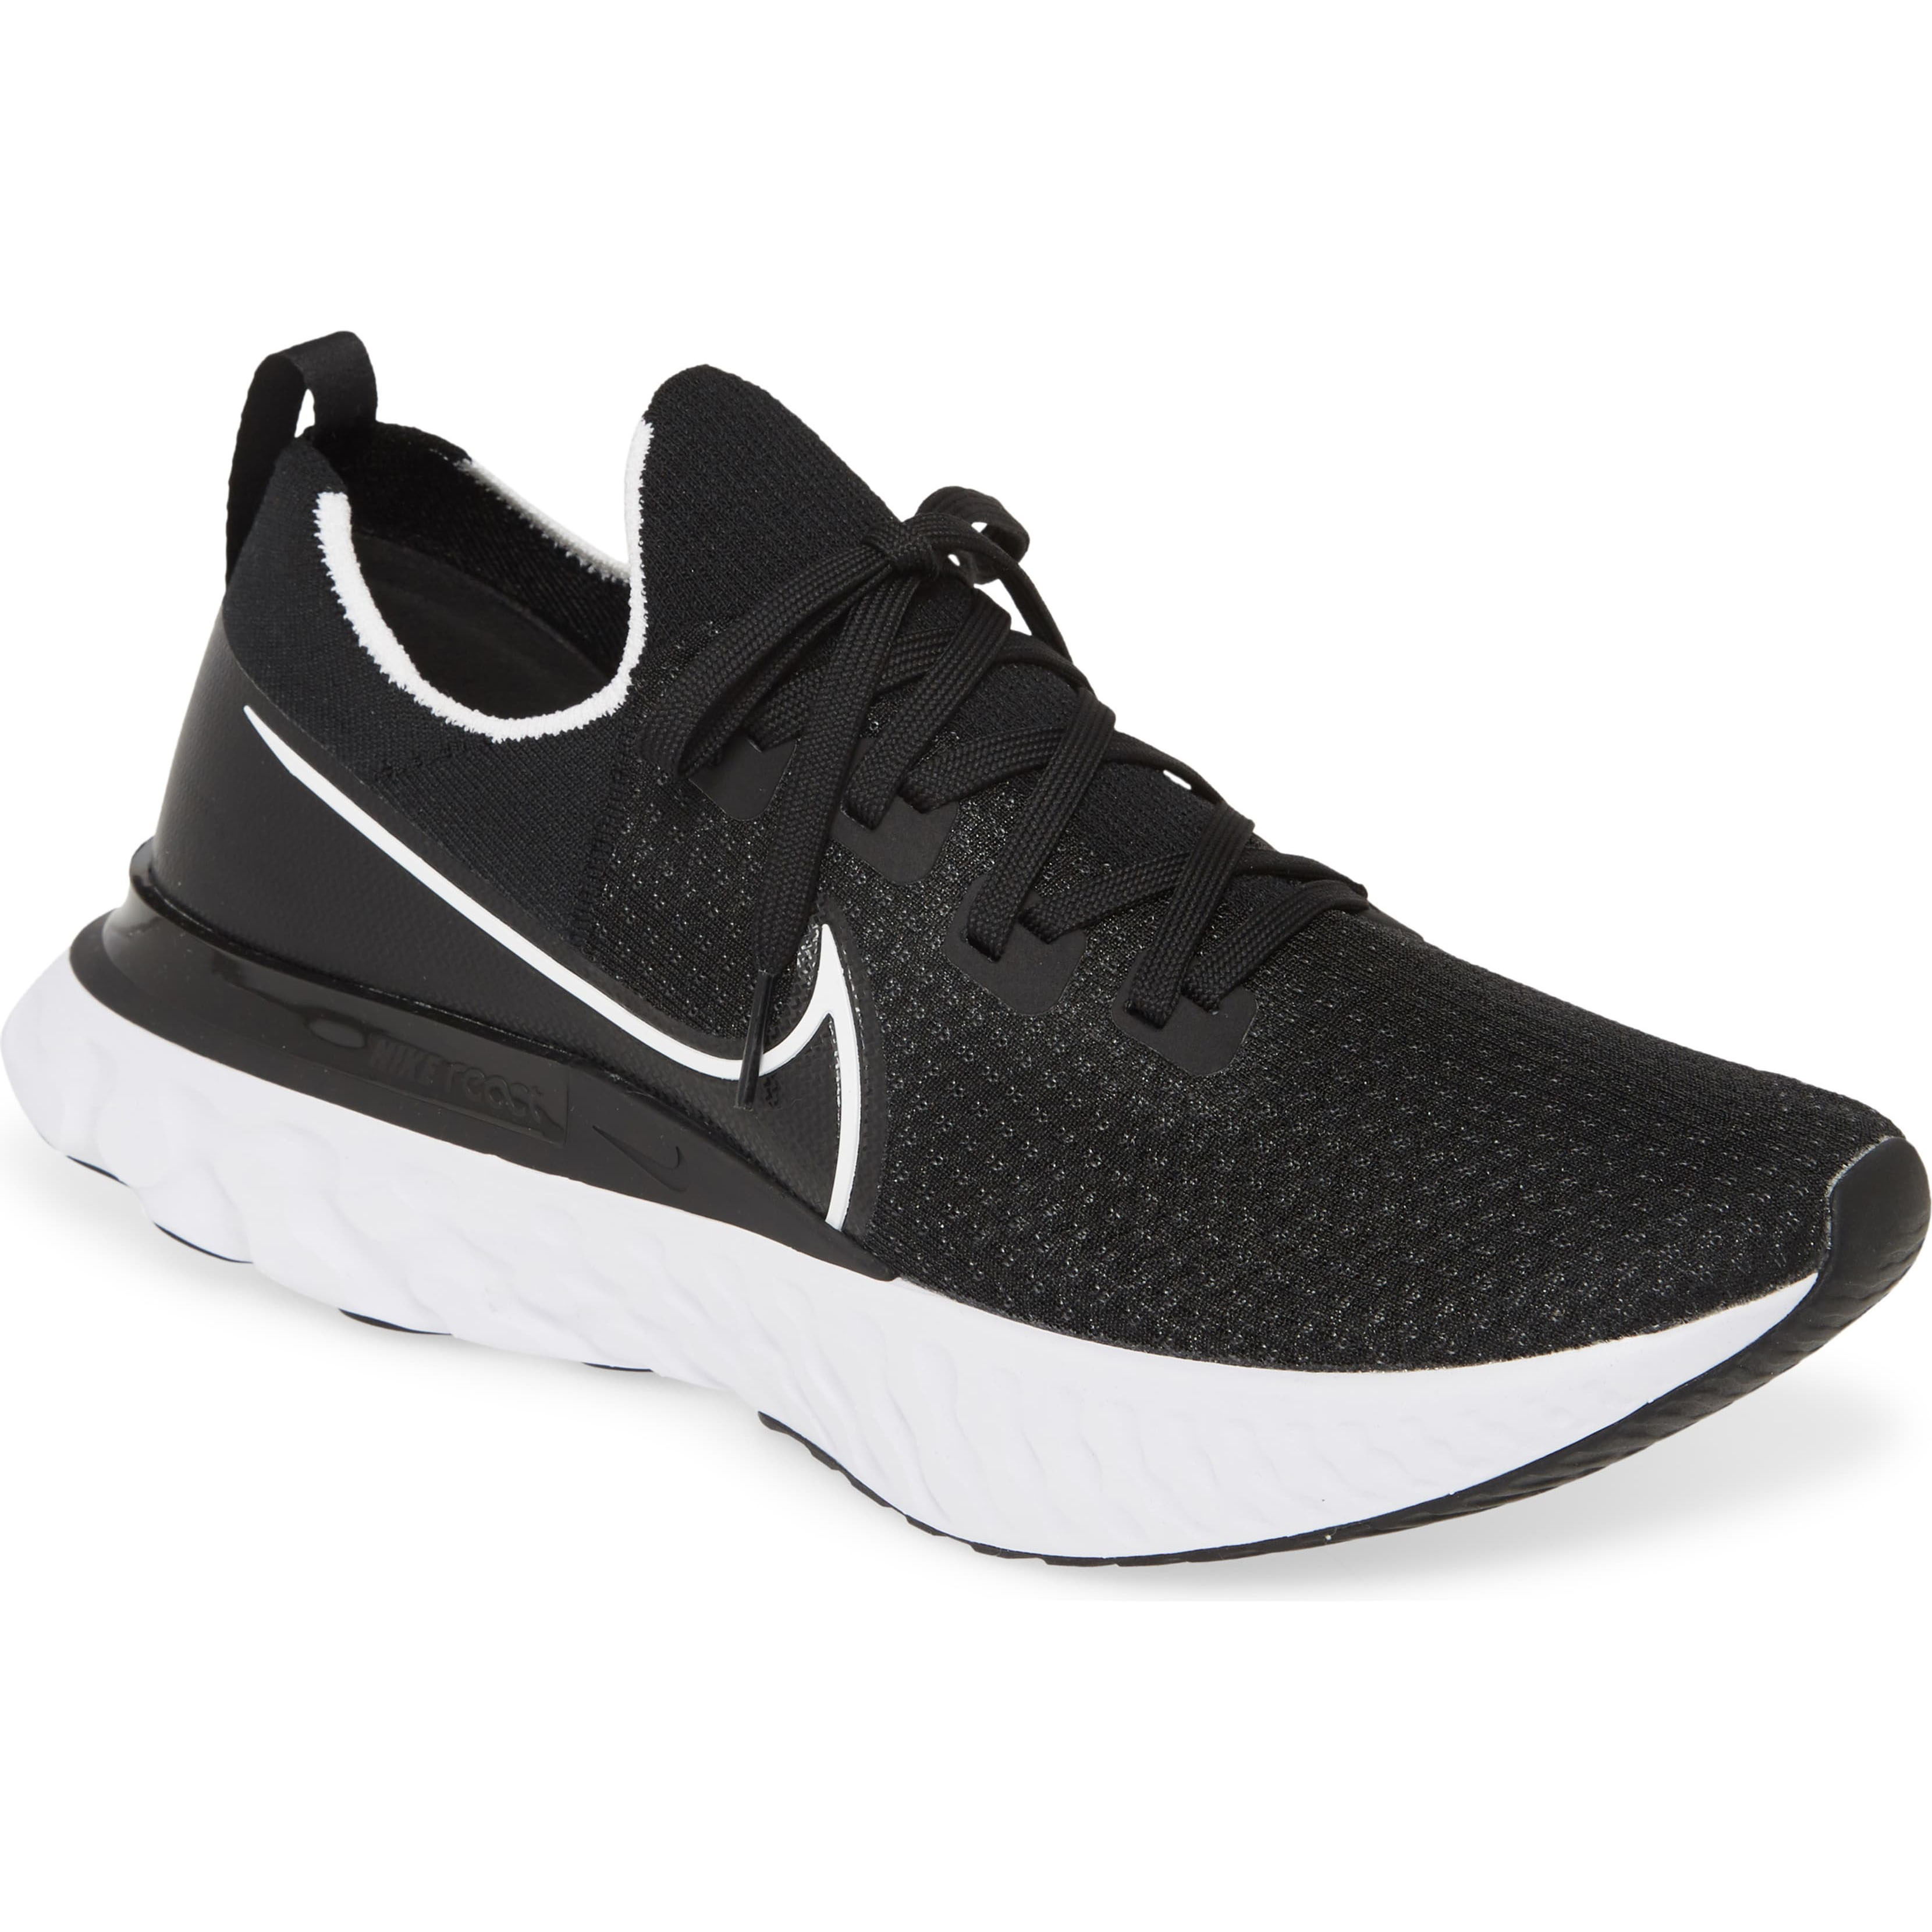 Nike React Infinity Run Flyknit running sneakers, best gift for men